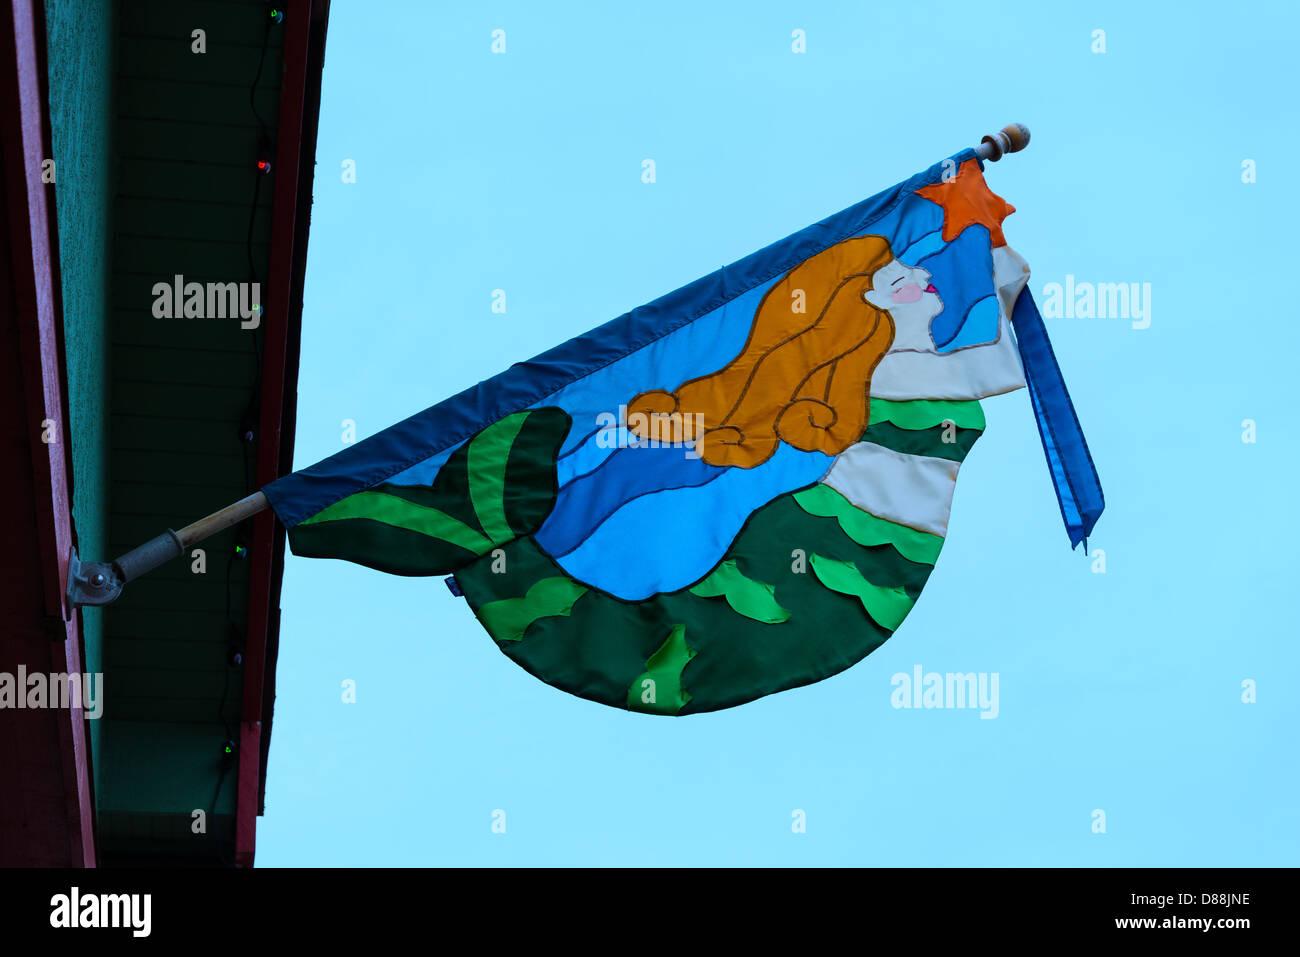 Mermaid banner. - Stock Image